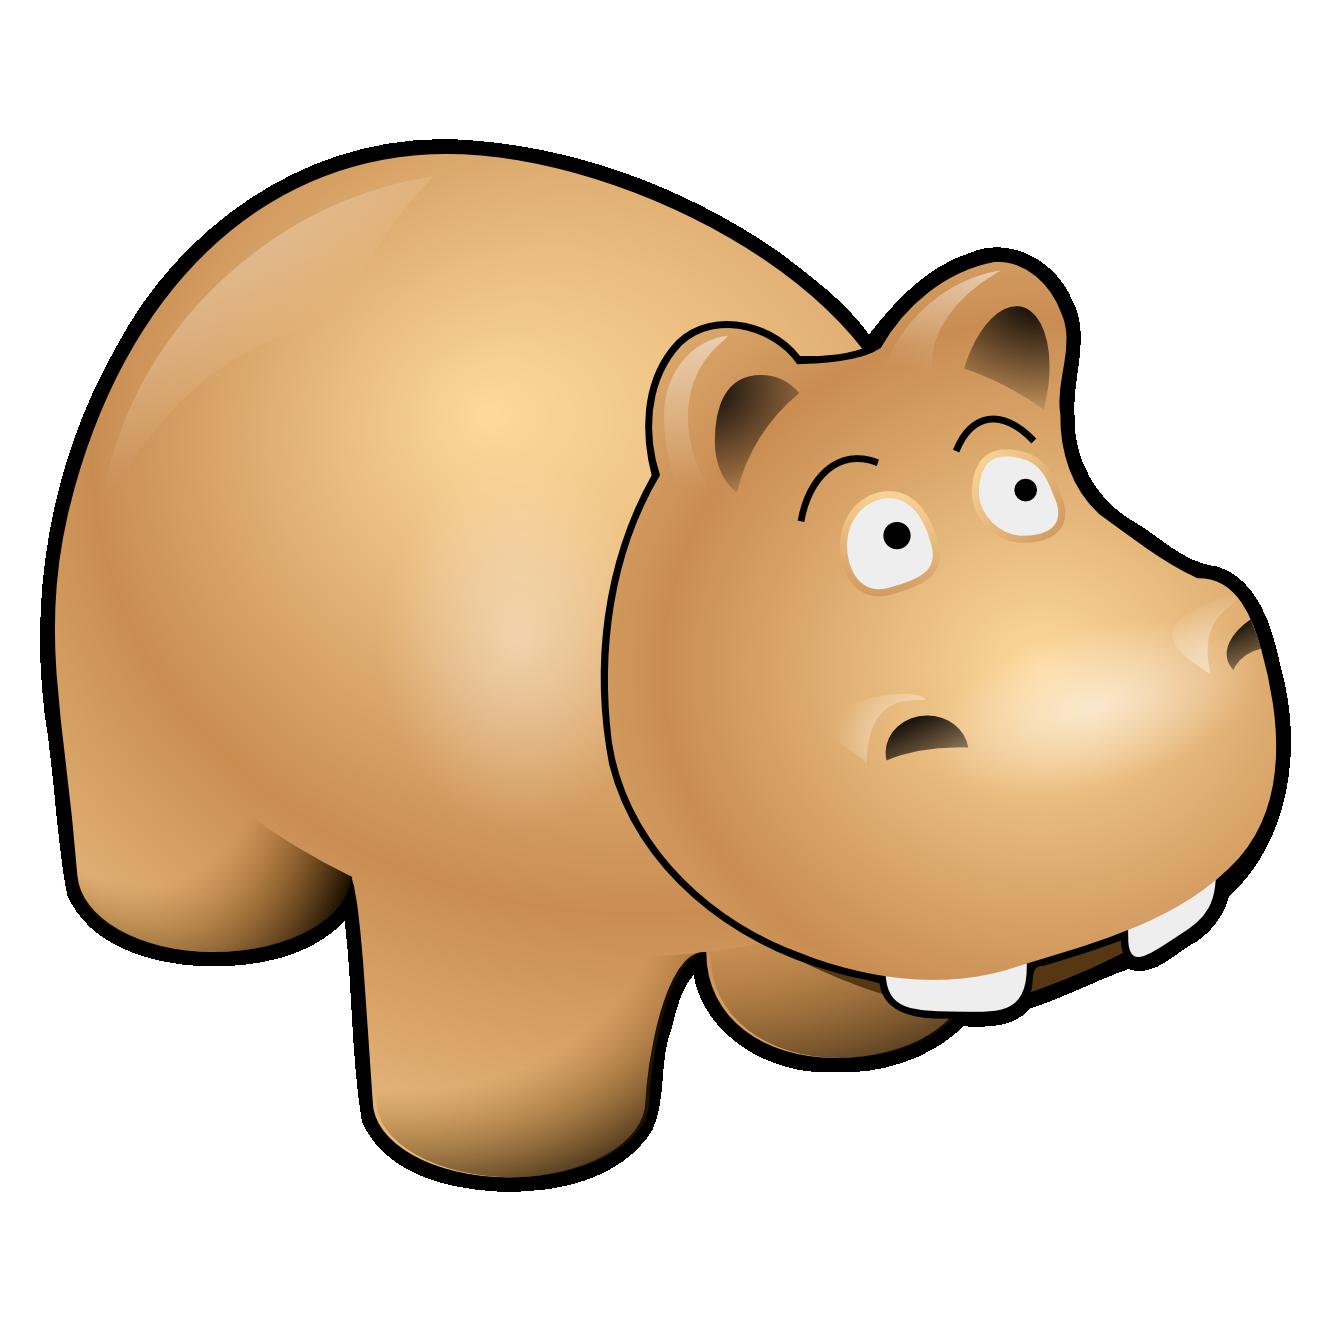 Hippo clipart cartoon. The mascot design gallery